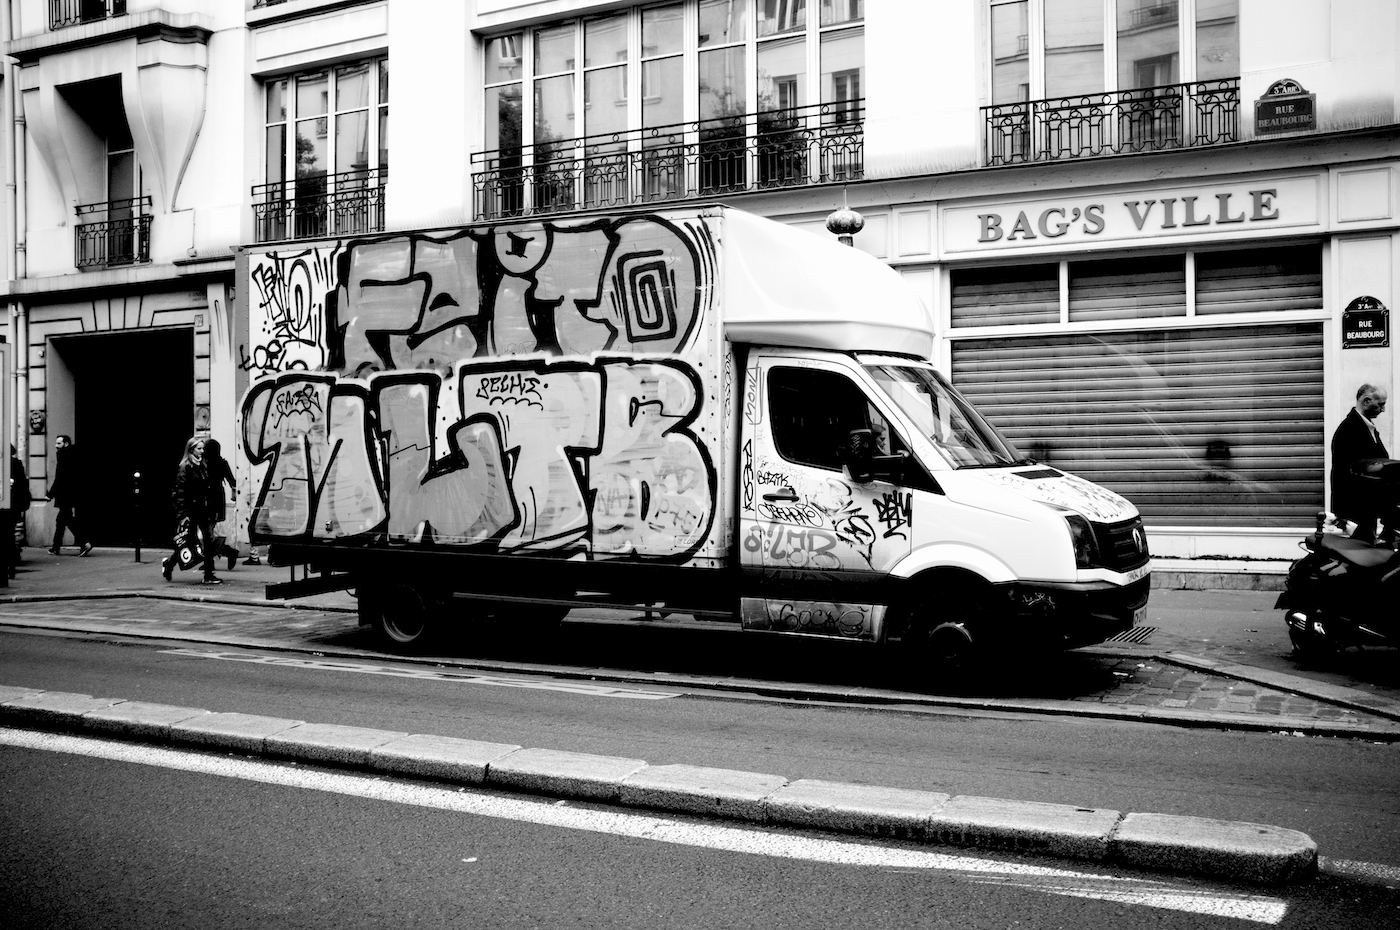 161126-marcvallee-Graffiti-Trucks-26.11.16.0026